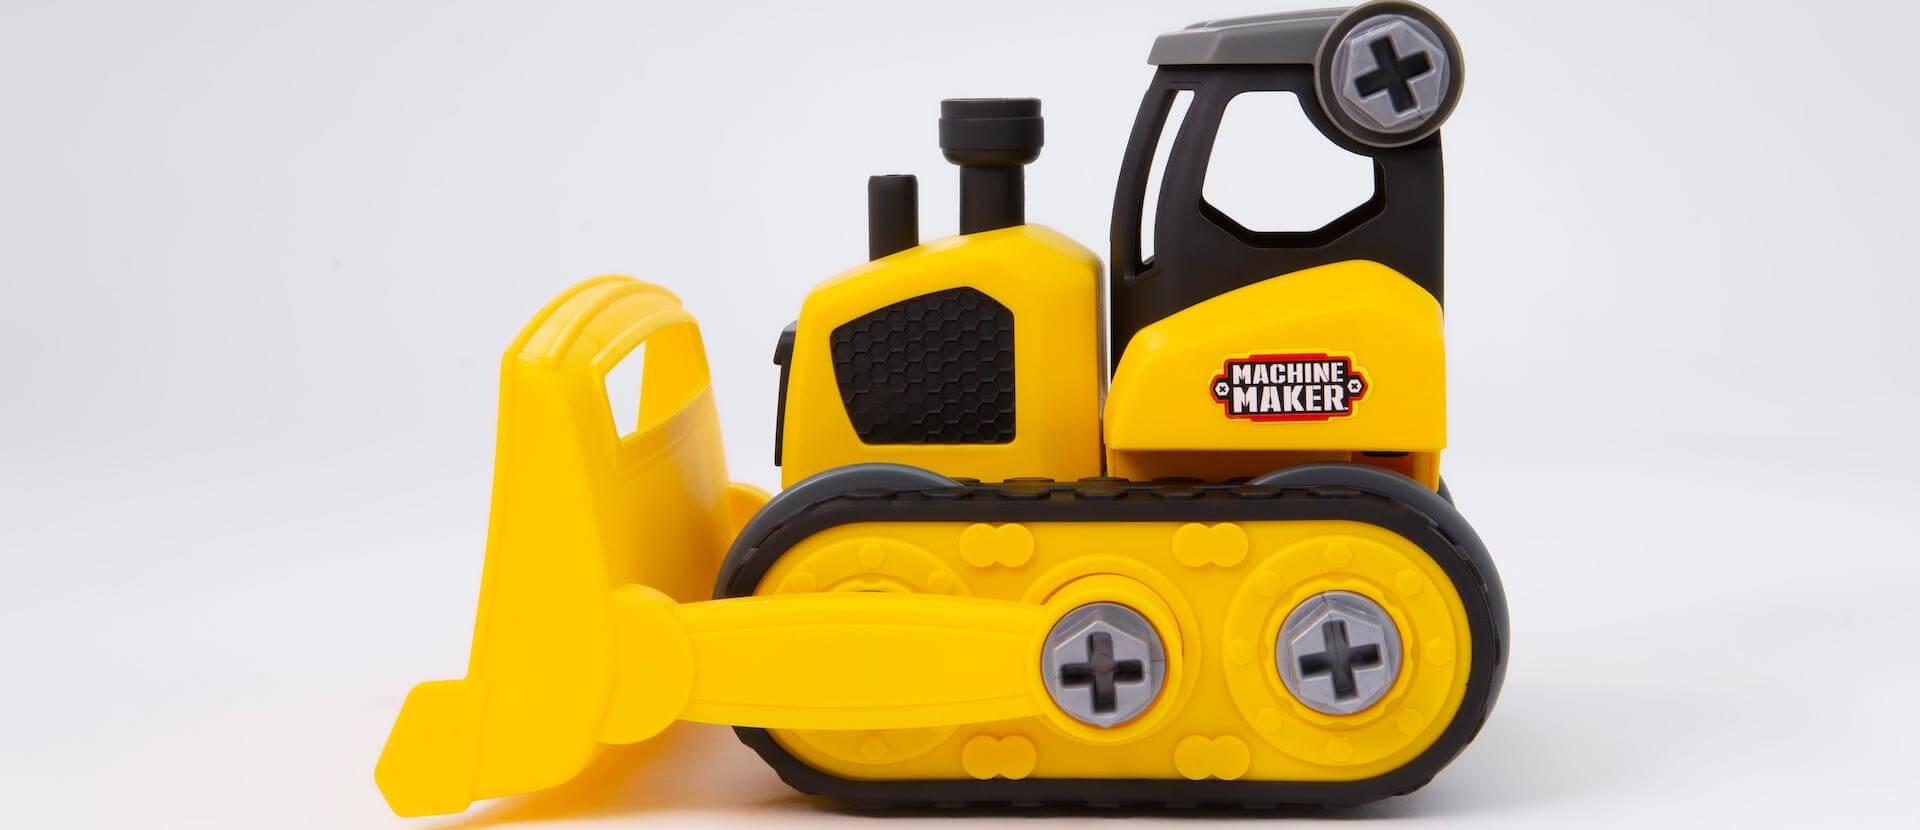 image4-MachineMaker_Dozer